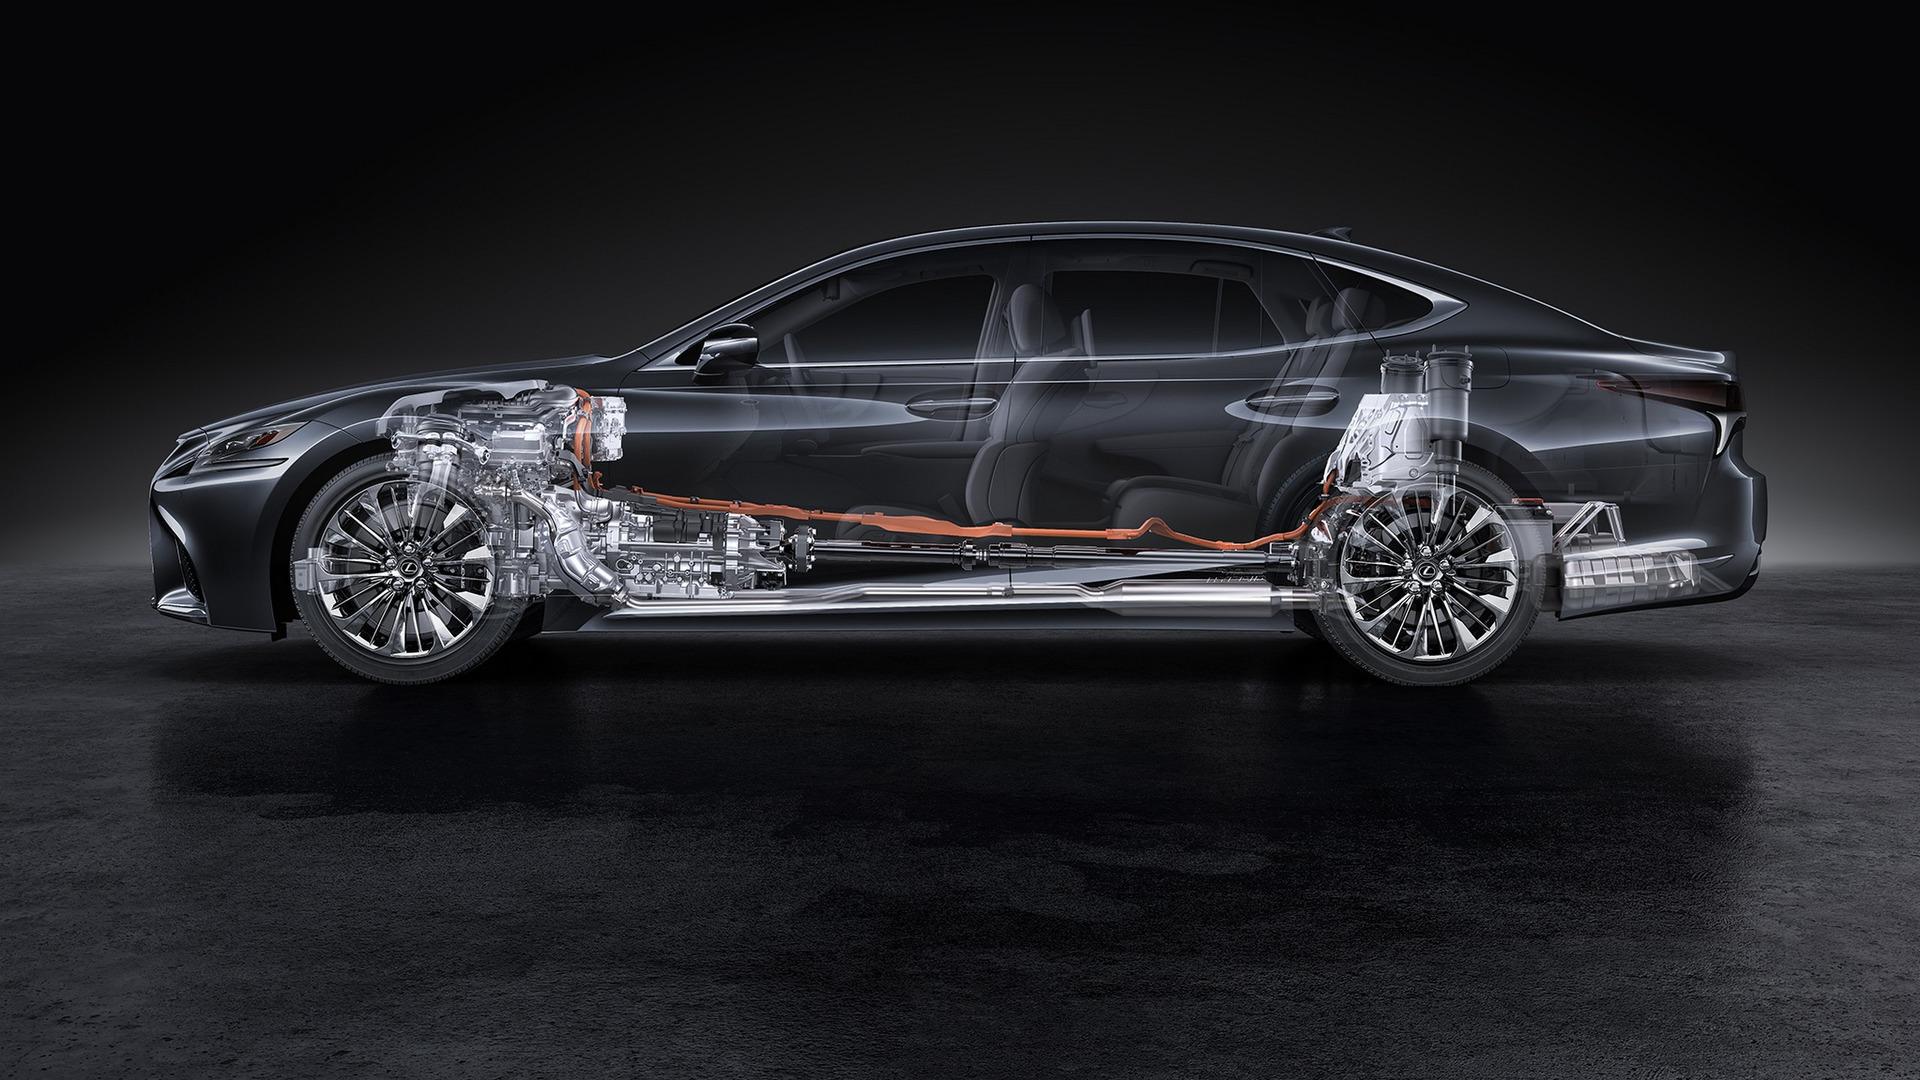 2018 Lexus Ls500h The Sophisticated Sedan For The Younger: New-gen 2018 Lexus LS Flagship Sedan